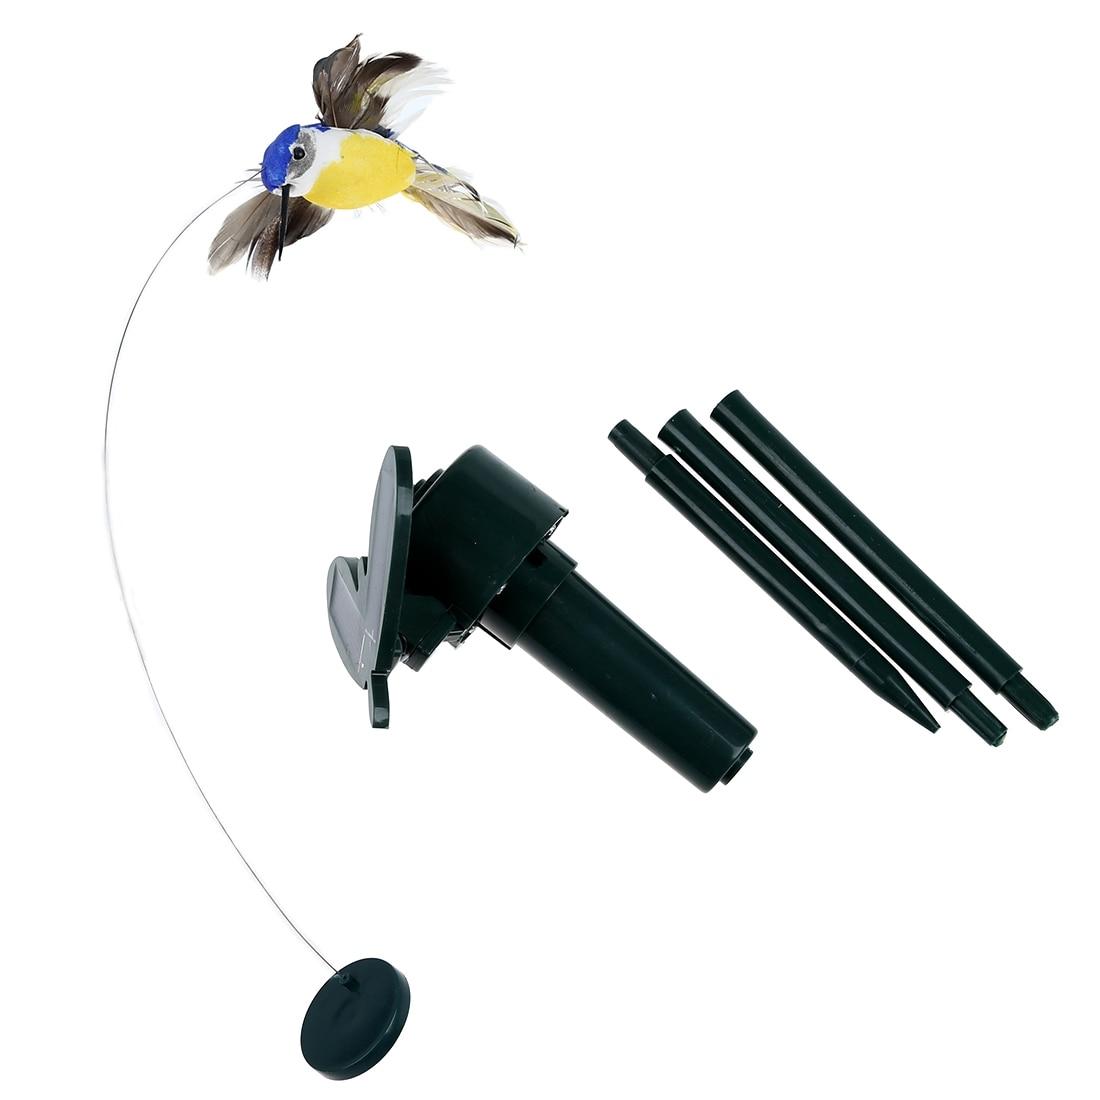 Solar Powered Fliegen Flatternde Hummingbird Flying Birds Farbe Kinder Spielzeug Zufall